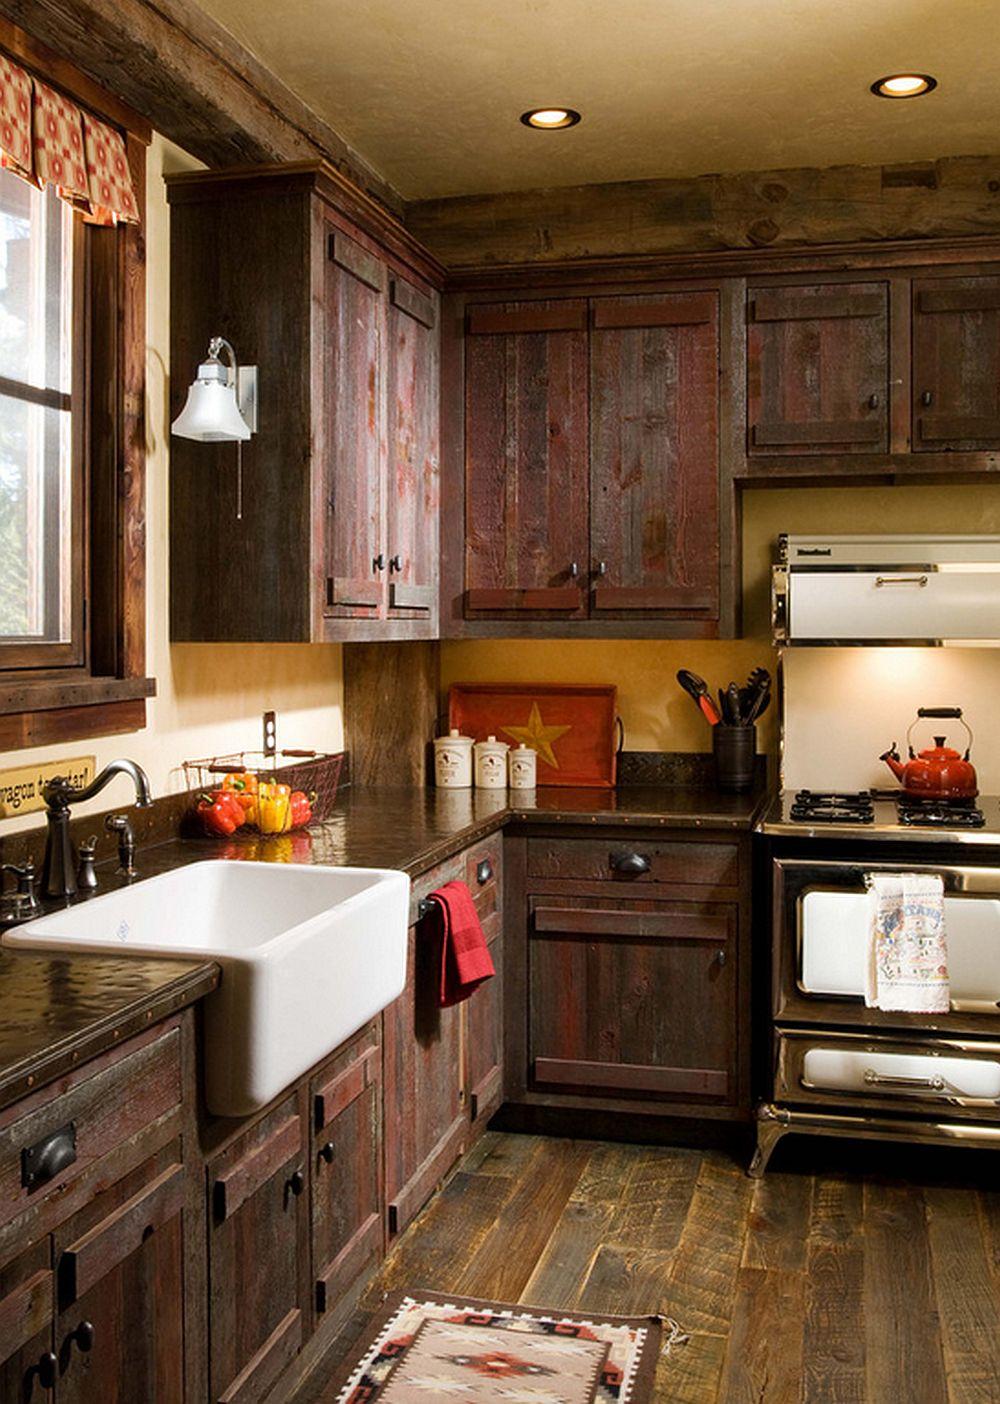 adelaparvu.com despre cabana din lemn vechi recuperat, cabana Swan Valley, Montana, RMT Architects (6)